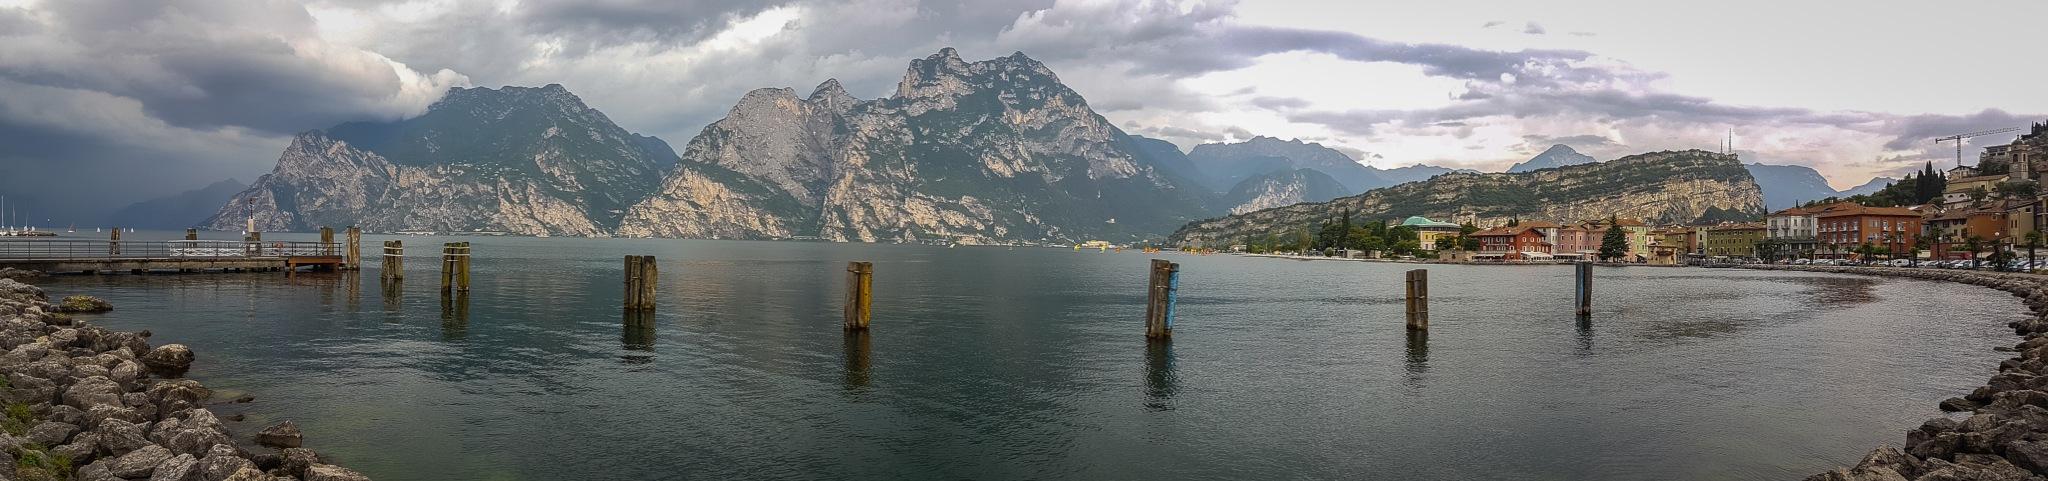 Panorama di Torbole by TommyR